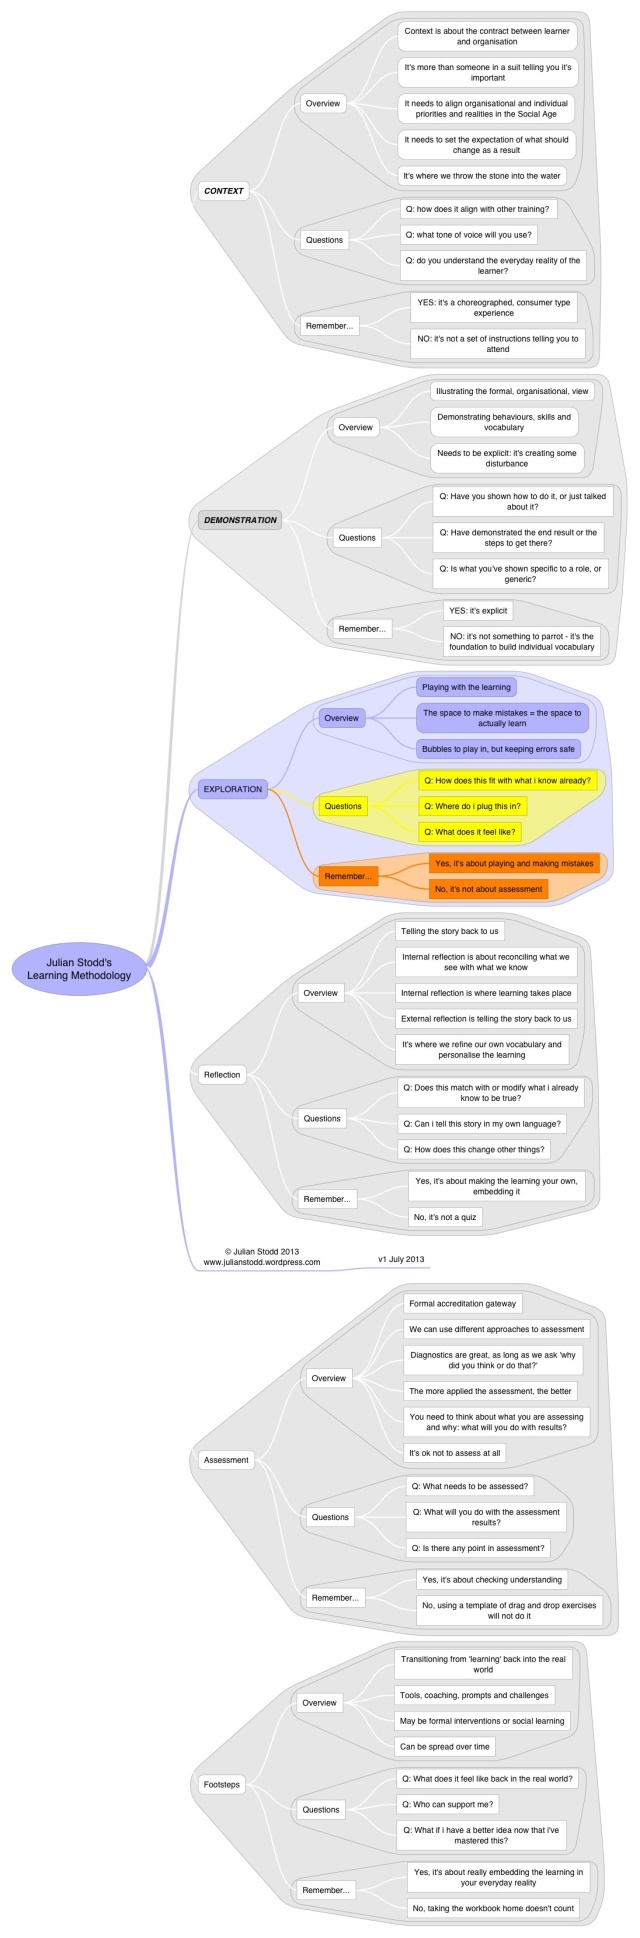 Methodology - exploration